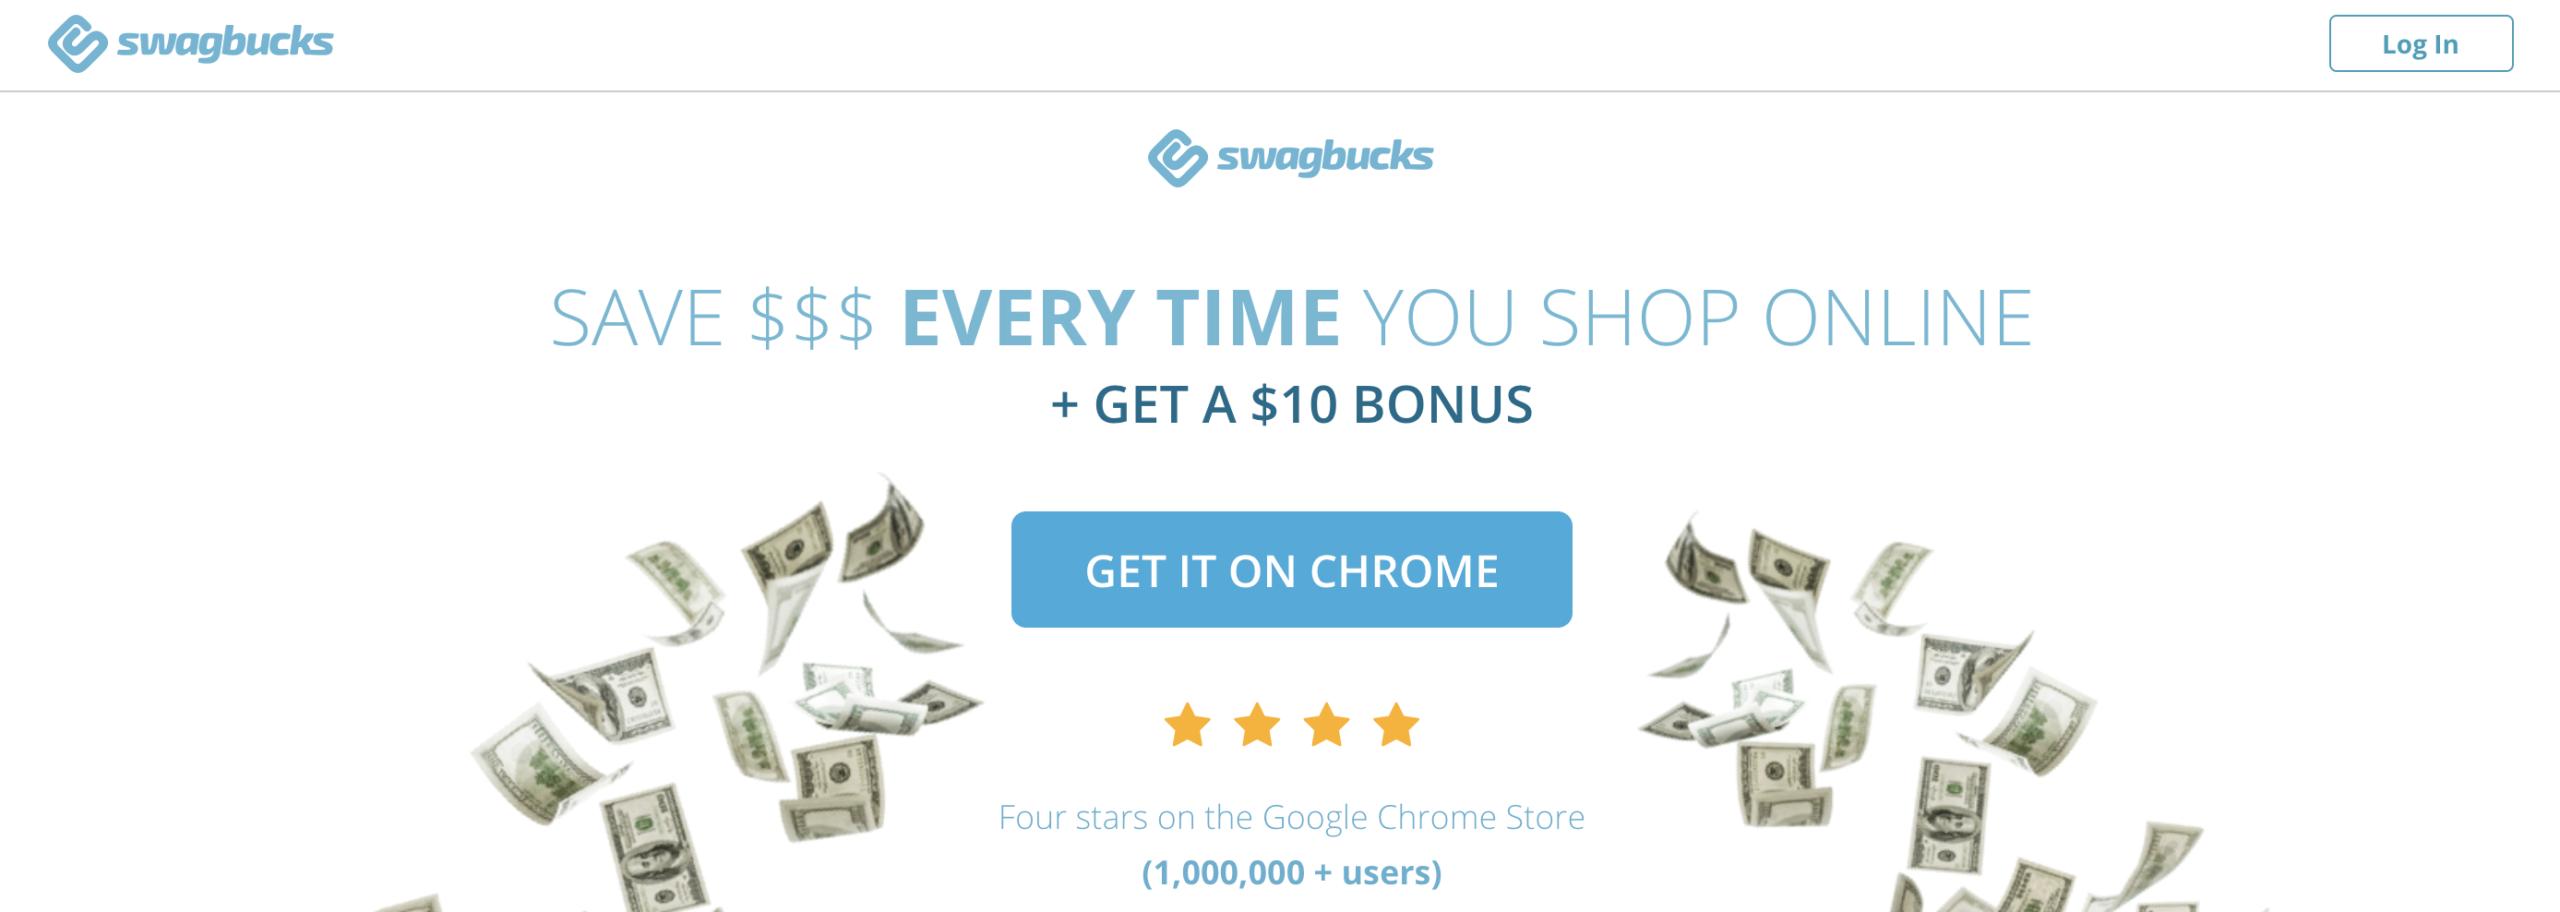 make money online with swagbucks